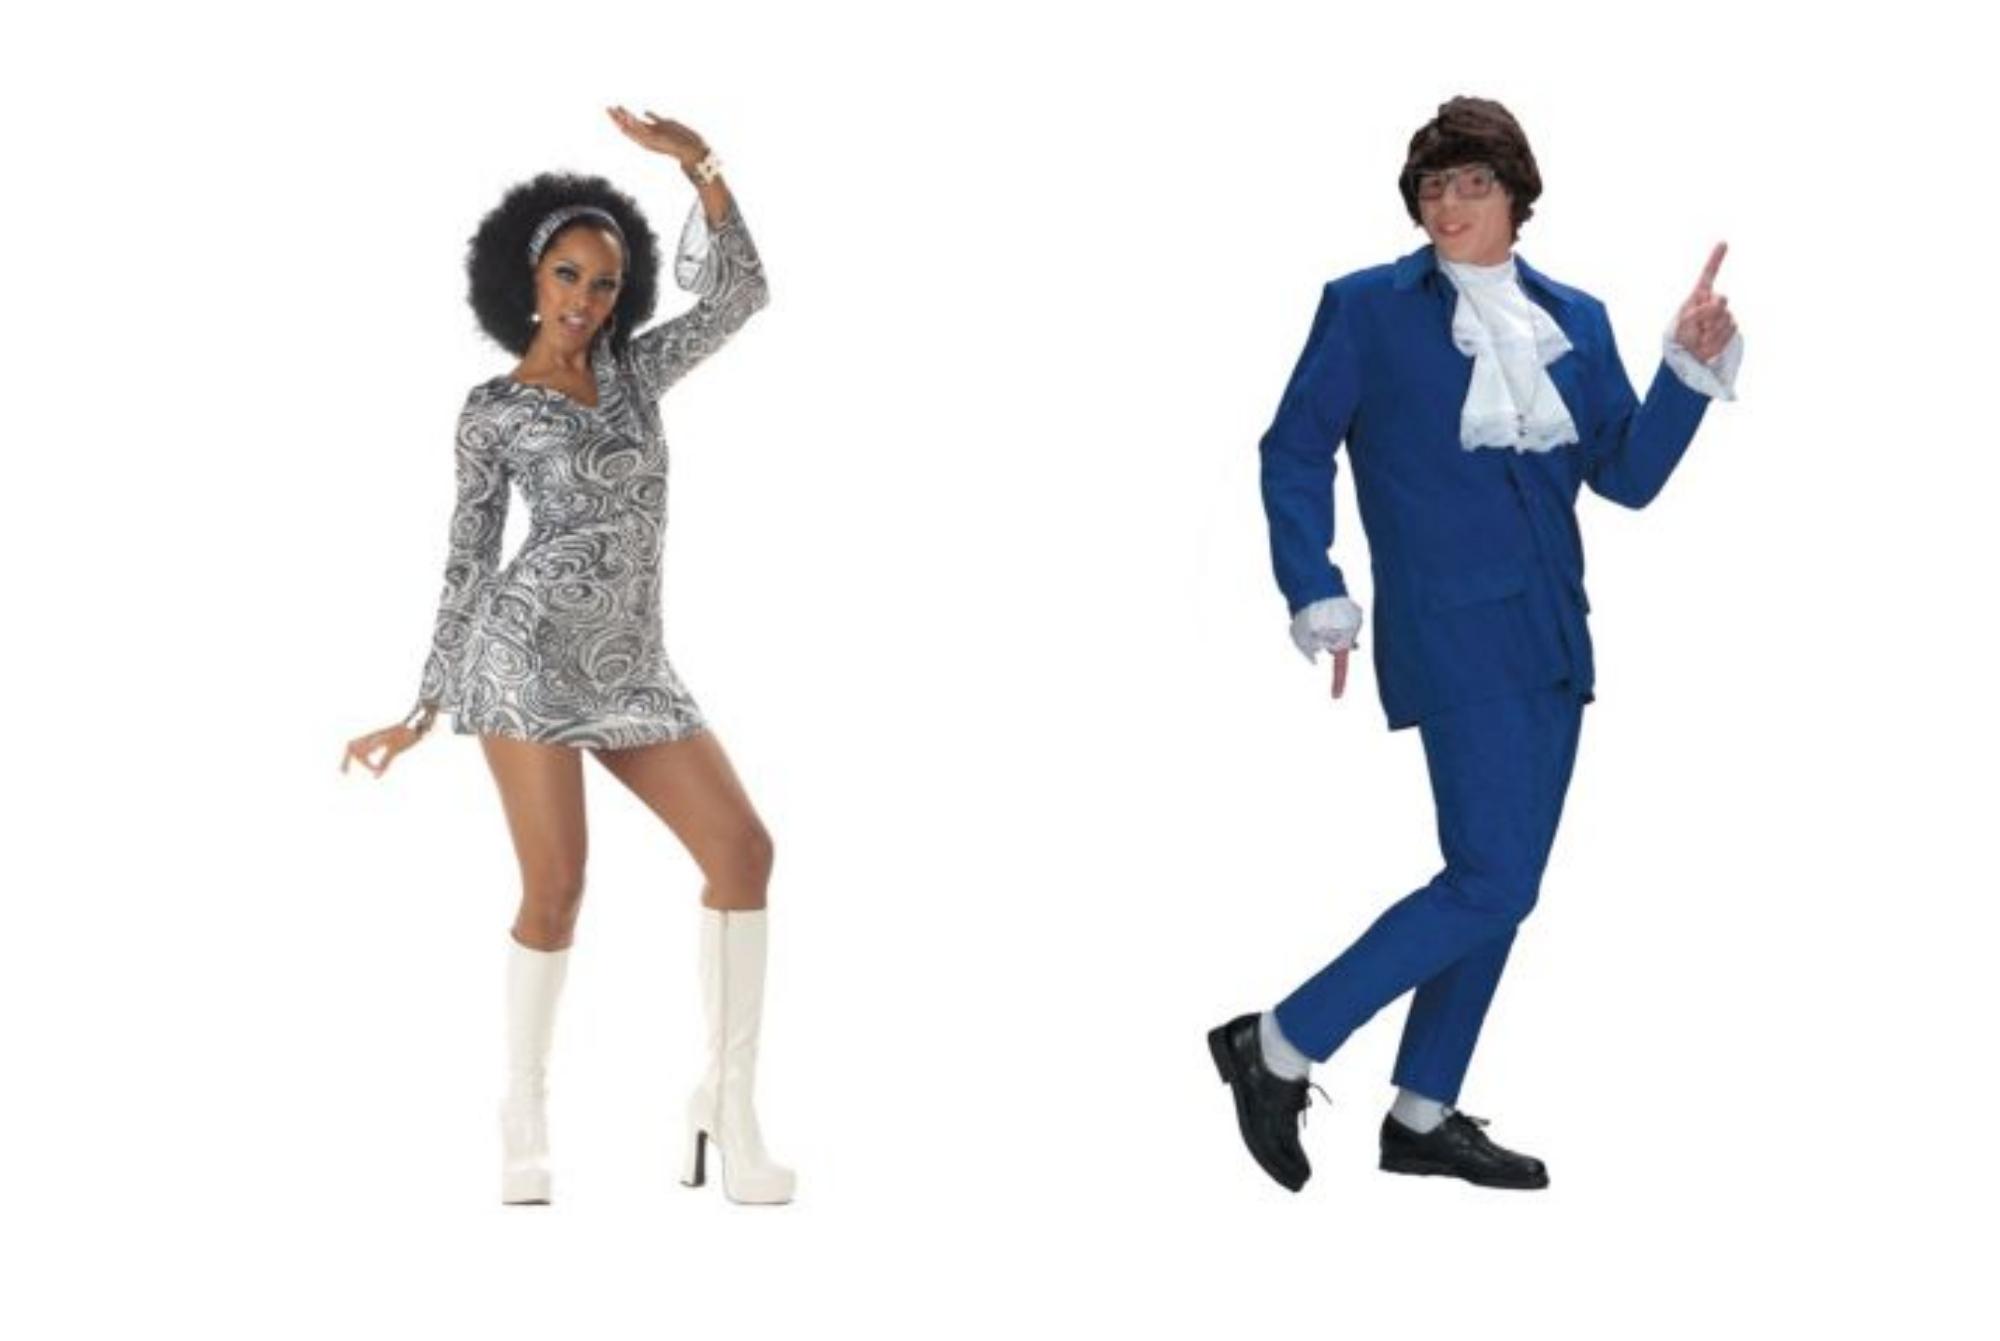 Austin Powers and groovy 60s girl Halloween costume